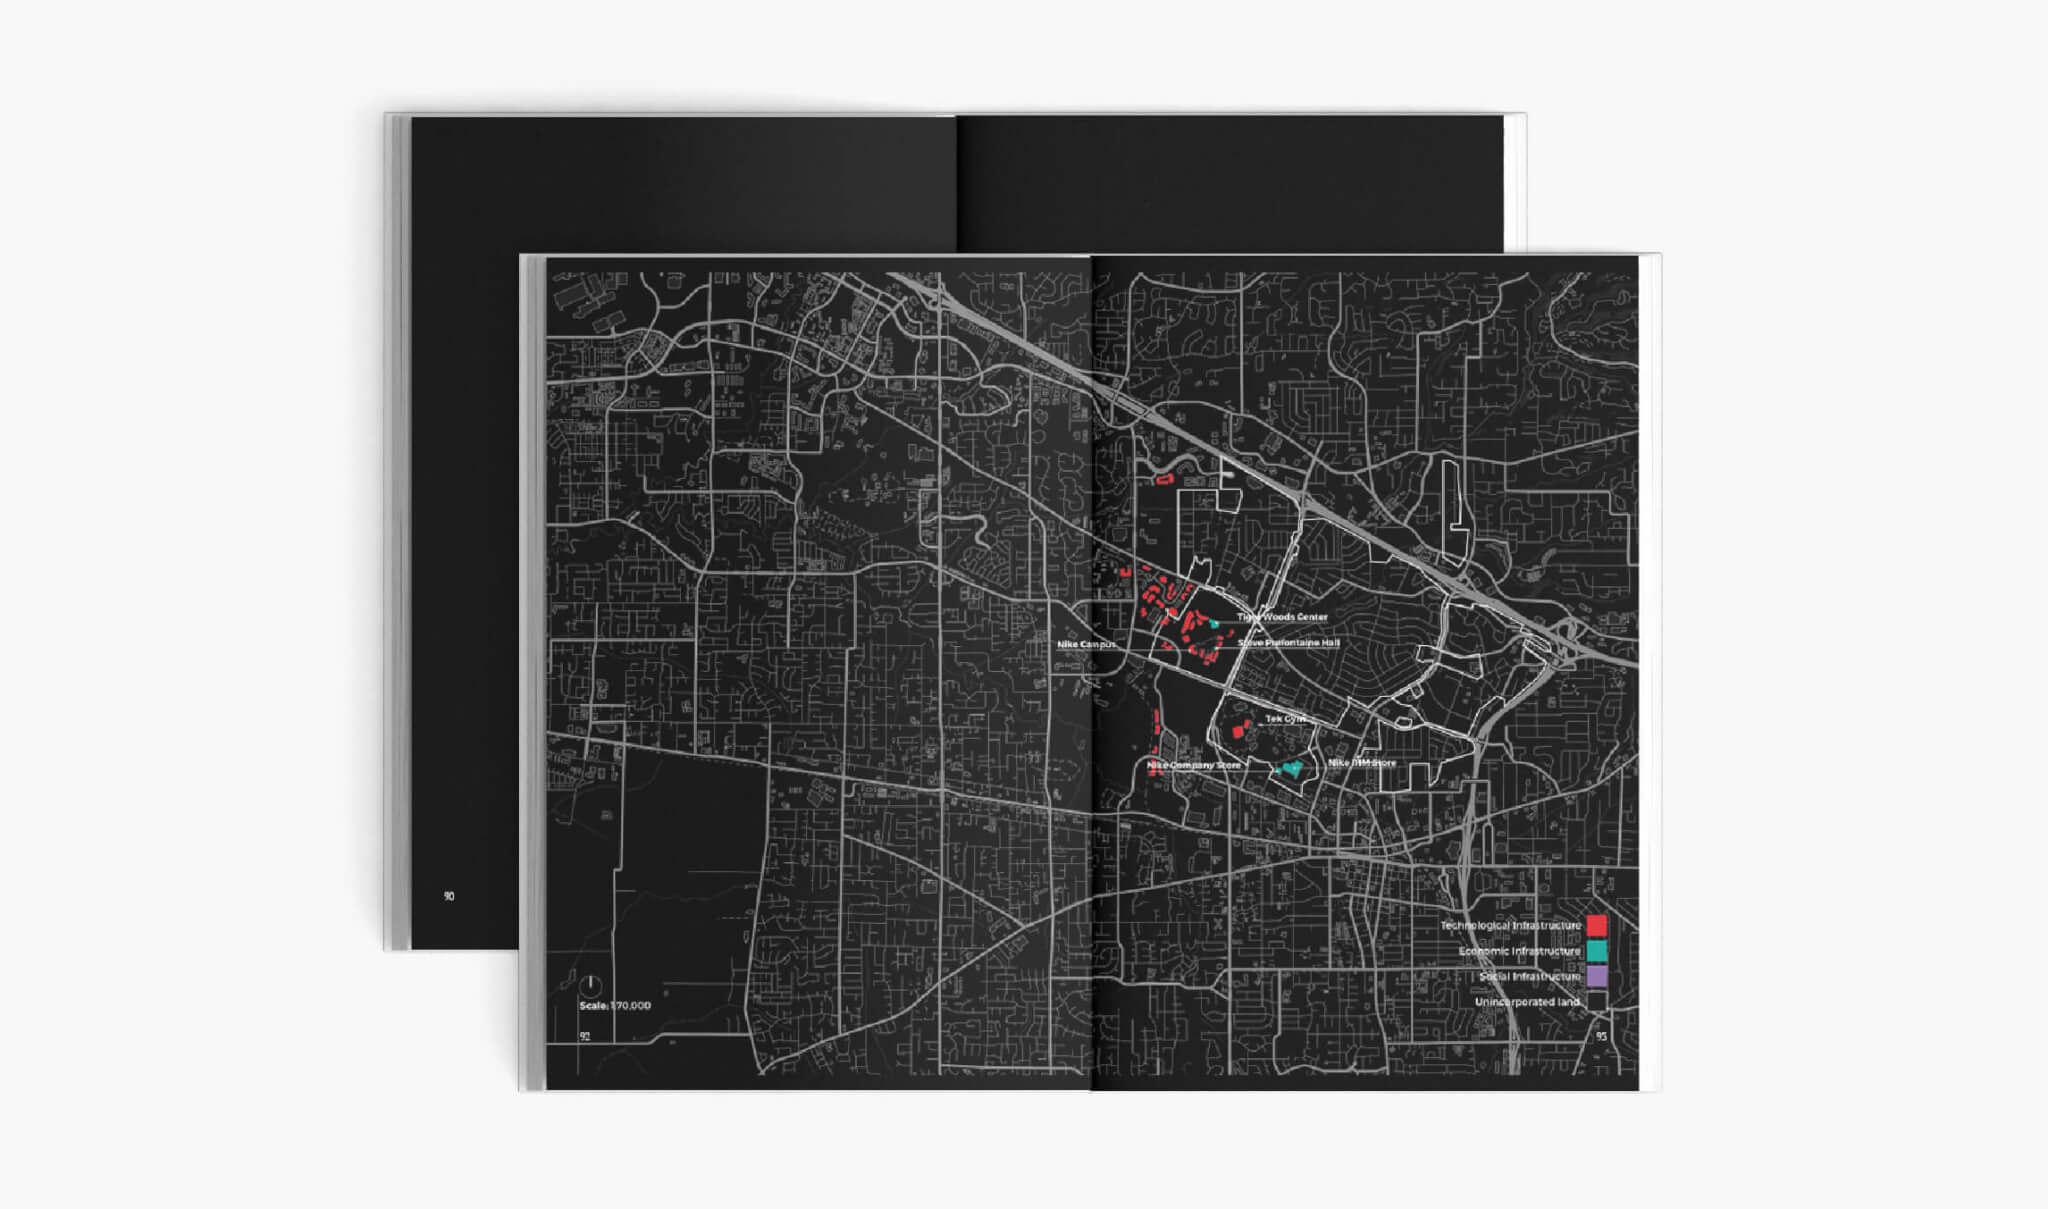 studio-interrobang-corporate-landscapes-mapping12